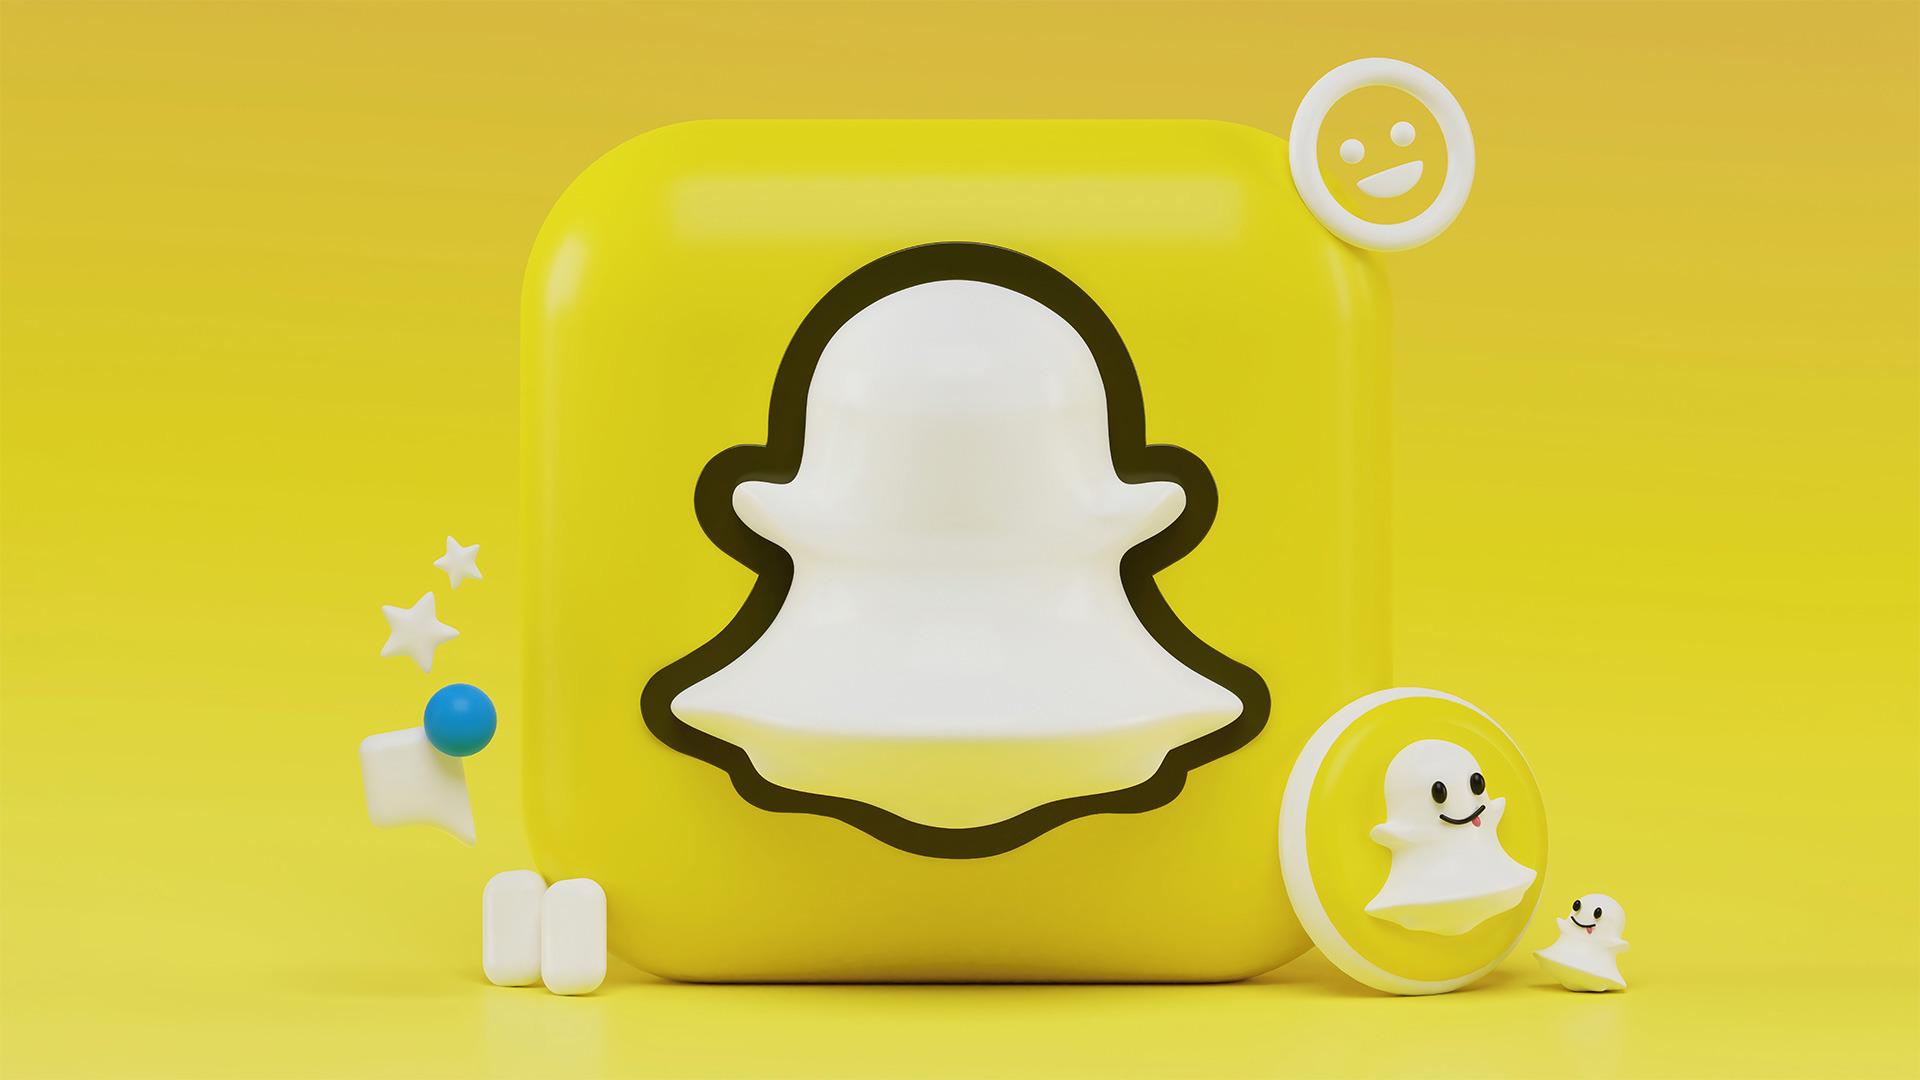 Social Network, Messenger, soziales Netzwerk, Chat, Kommunikation, Instant Messenger, Messaging, chatten, Snapchat, Snap